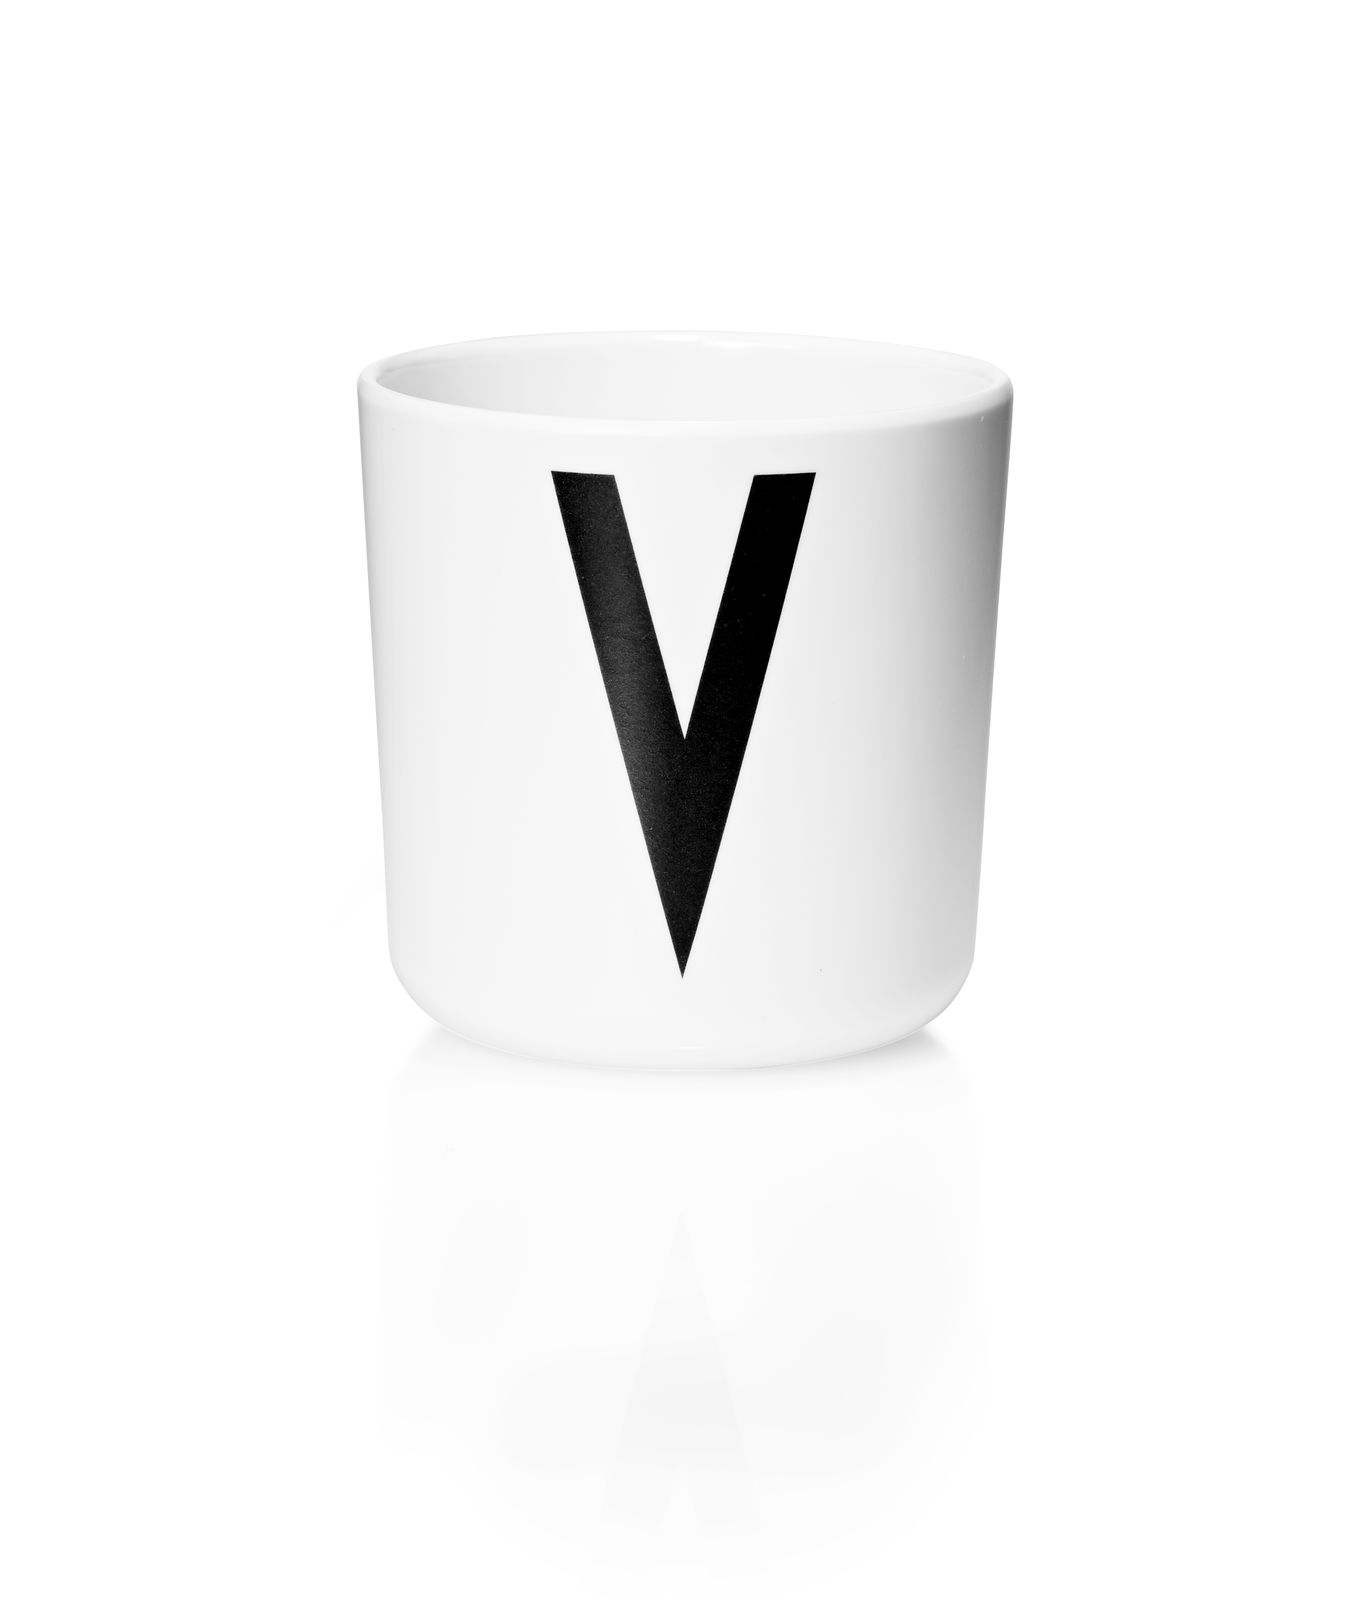 Design Letters - Personal Melamine Cup V - White (20201000V)